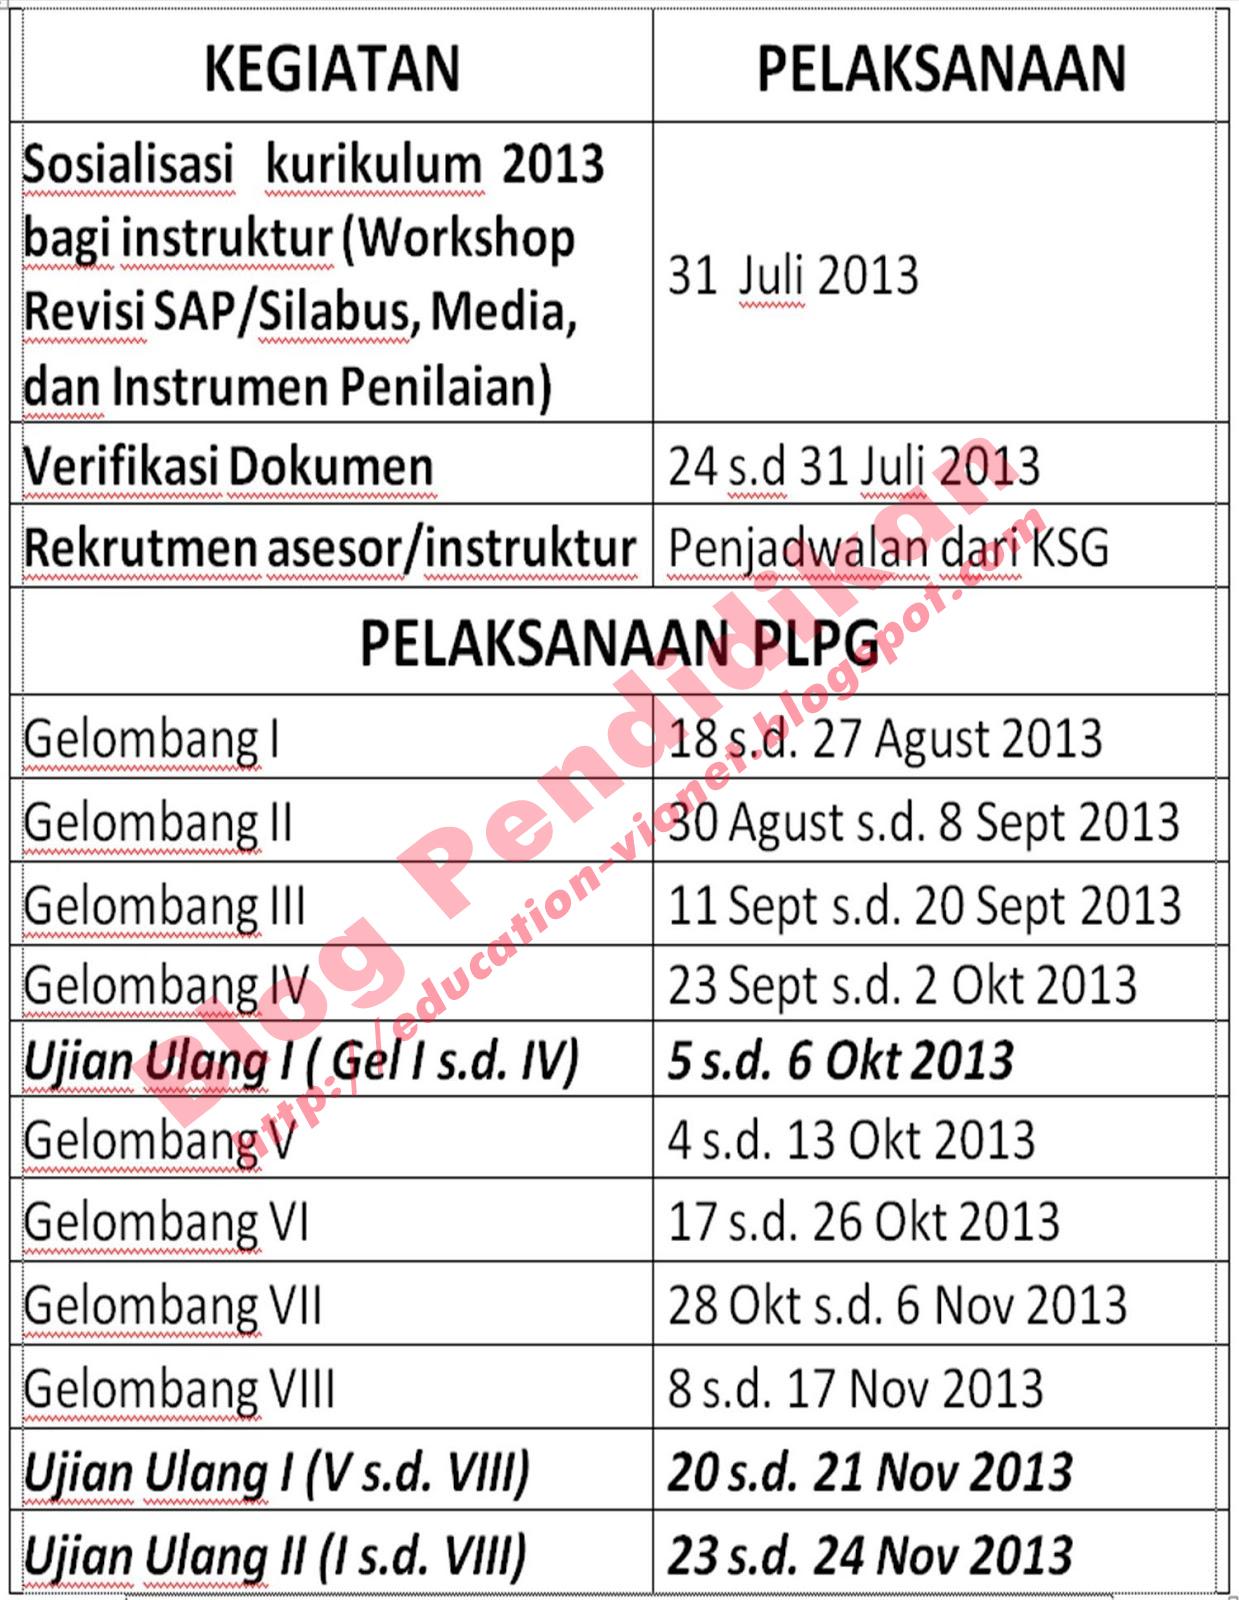 Cpns Guru 2013 Jawa Barat Informasi Lowongan Kerja Loker Terbaru 2016 2017 Read More On Up Date Penetapan Nip Cpns K2 Di Banten And Jawa Barat